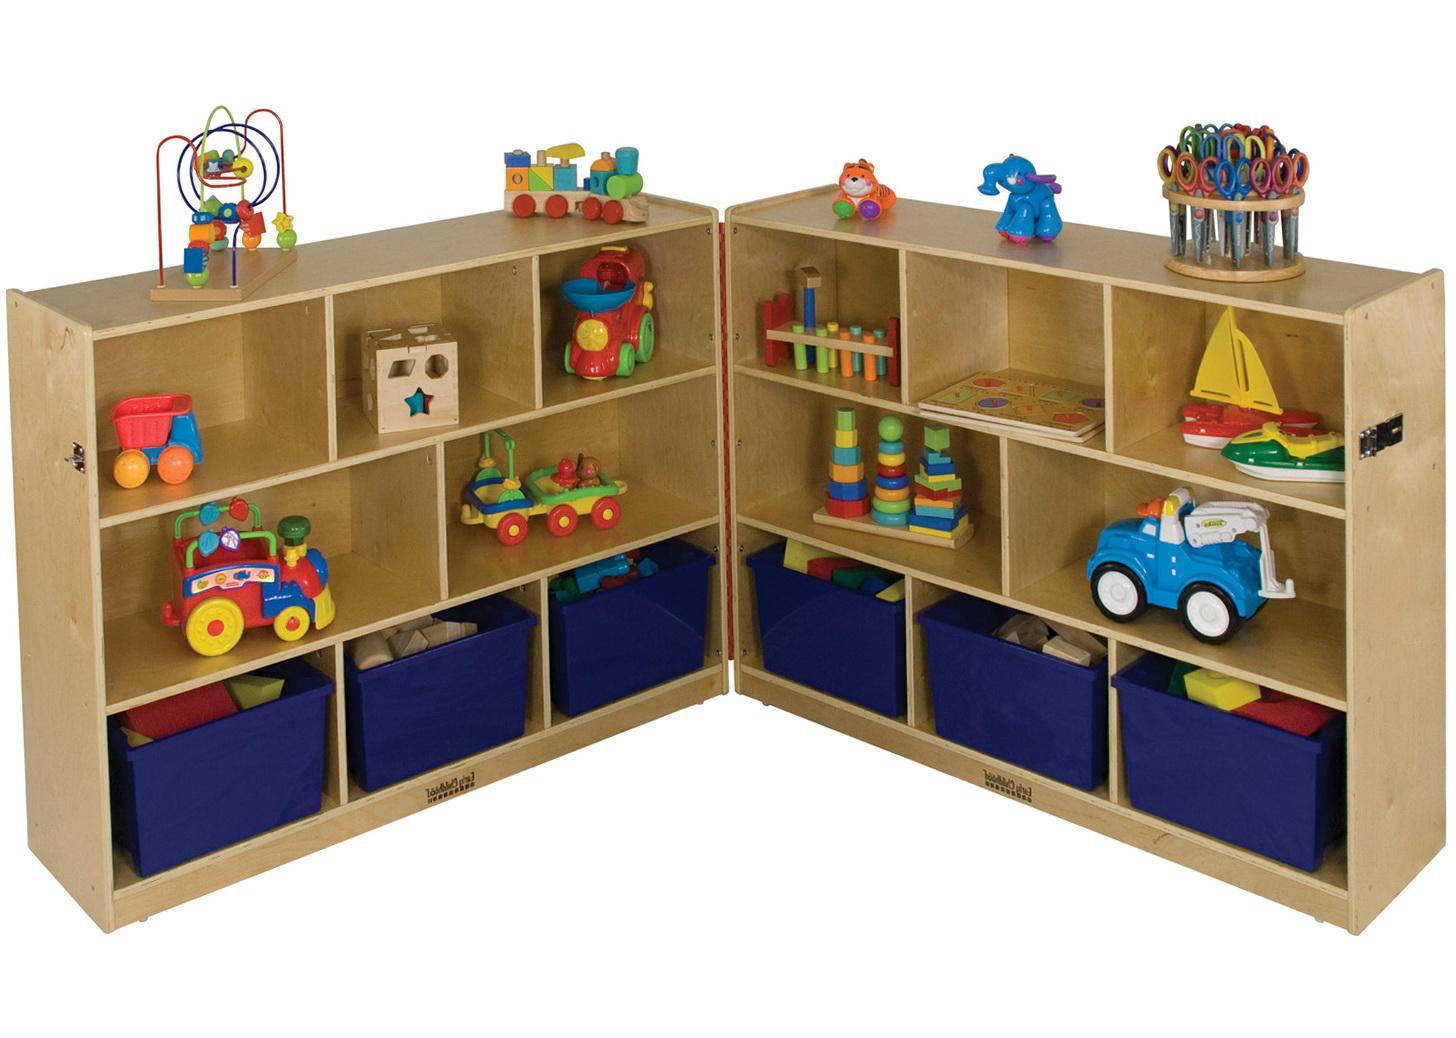 Childrens Bookshelves Ikea Home Design Ideas - Childrens bookshelves